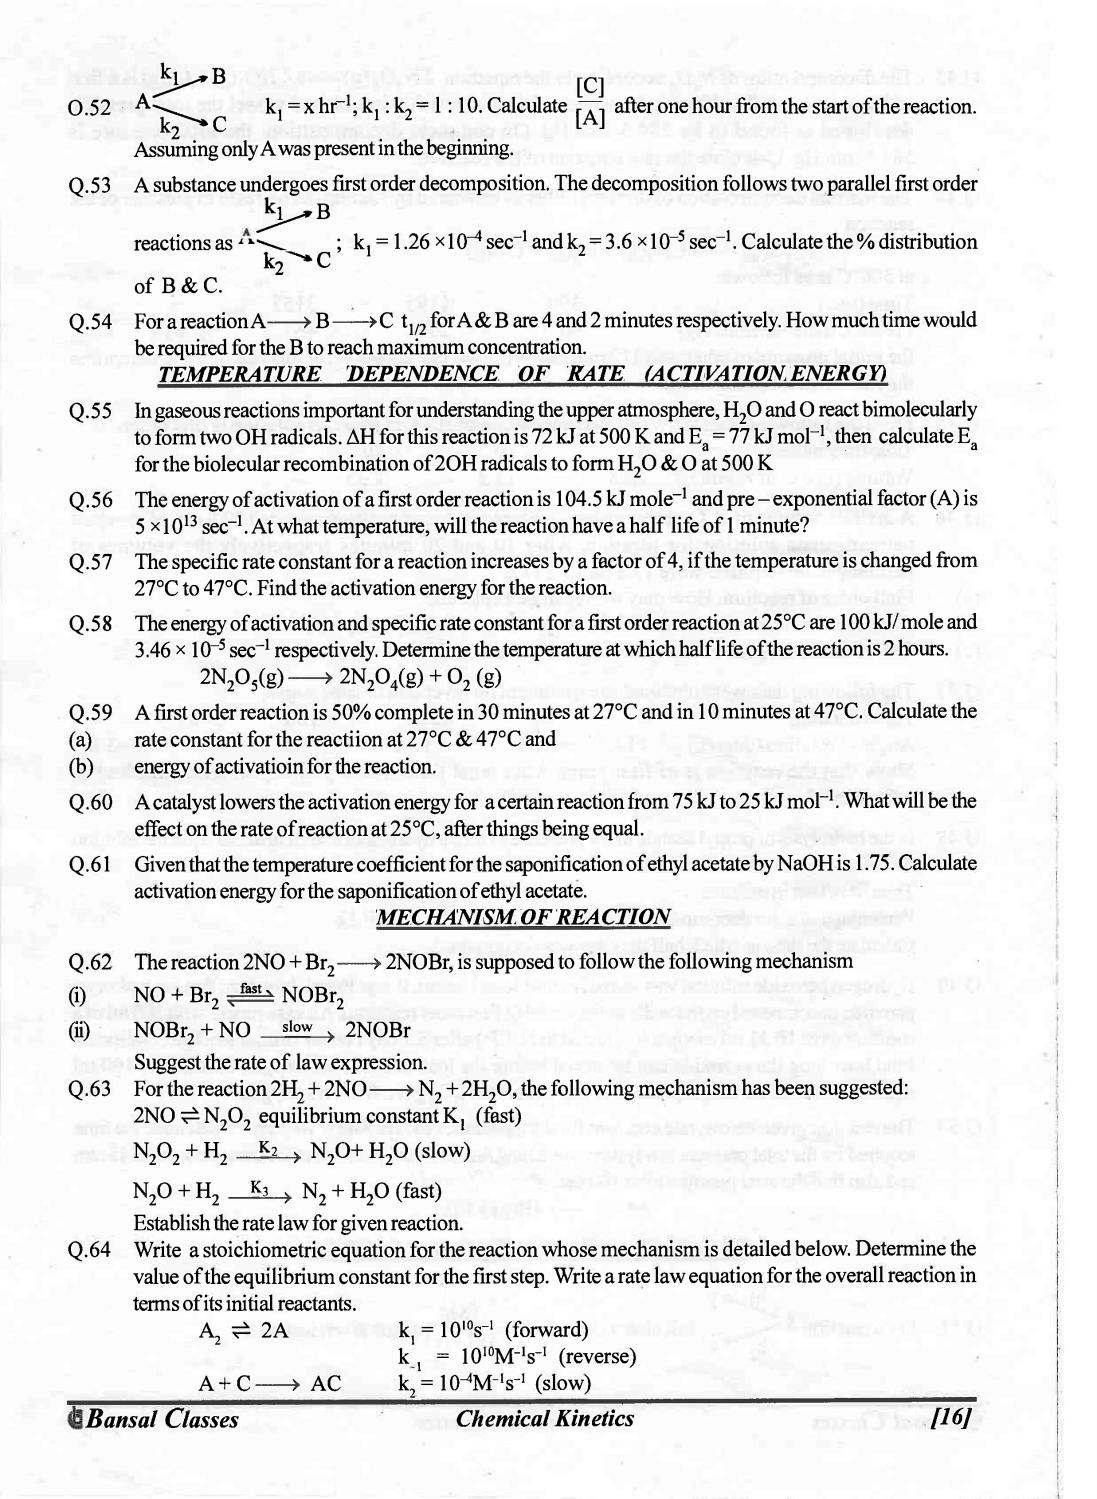 Bansal classes chemistry study material for iit jee by S.Dharmaraj - issuu